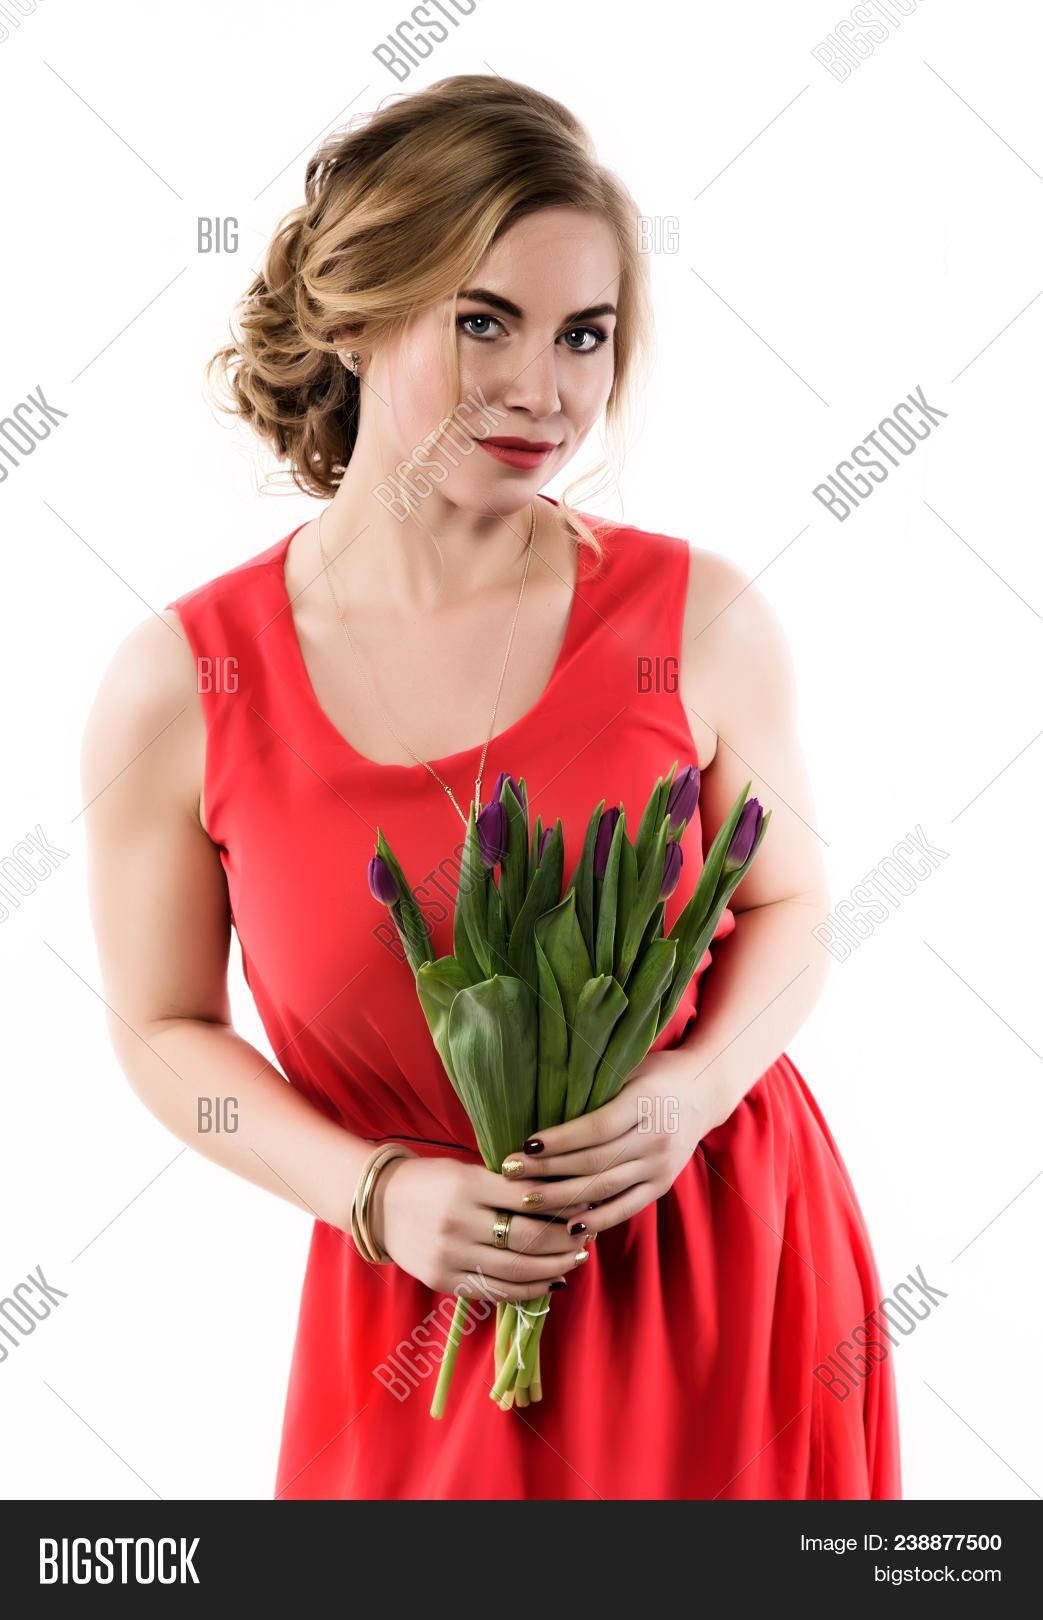 Beautiful woman flowers tulips on image photo bigstock beautiful woman with flowers tulips on a light background izmirmasajfo